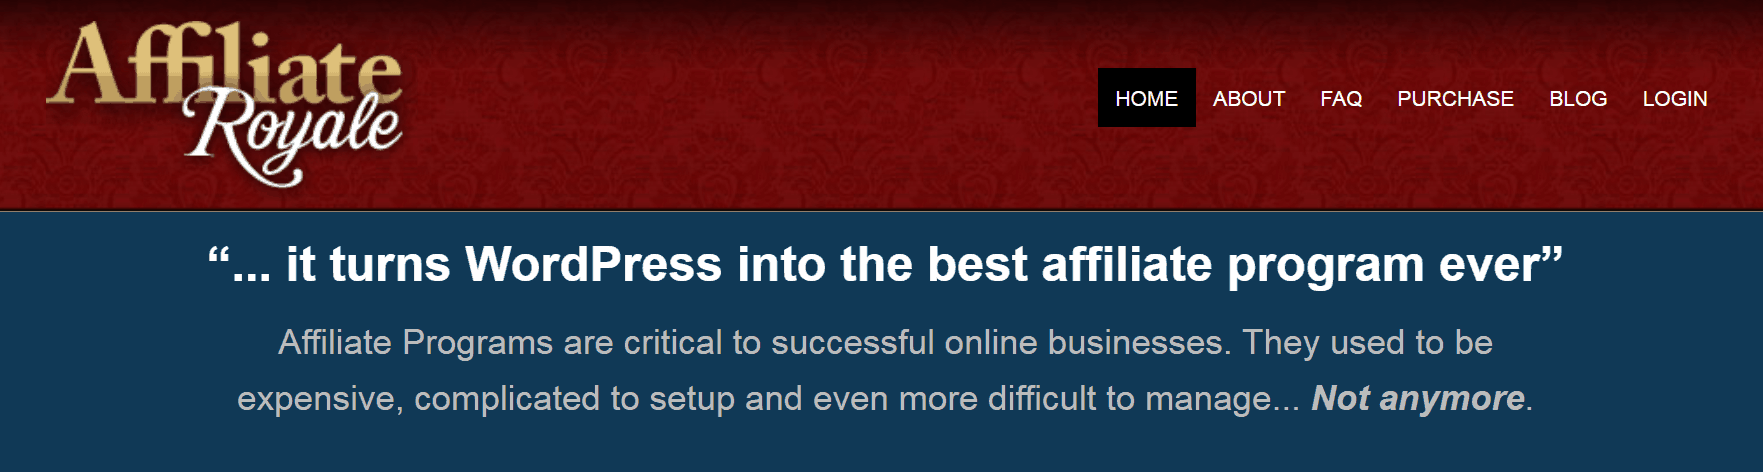 The Affiliate Royale WordPress plugin.